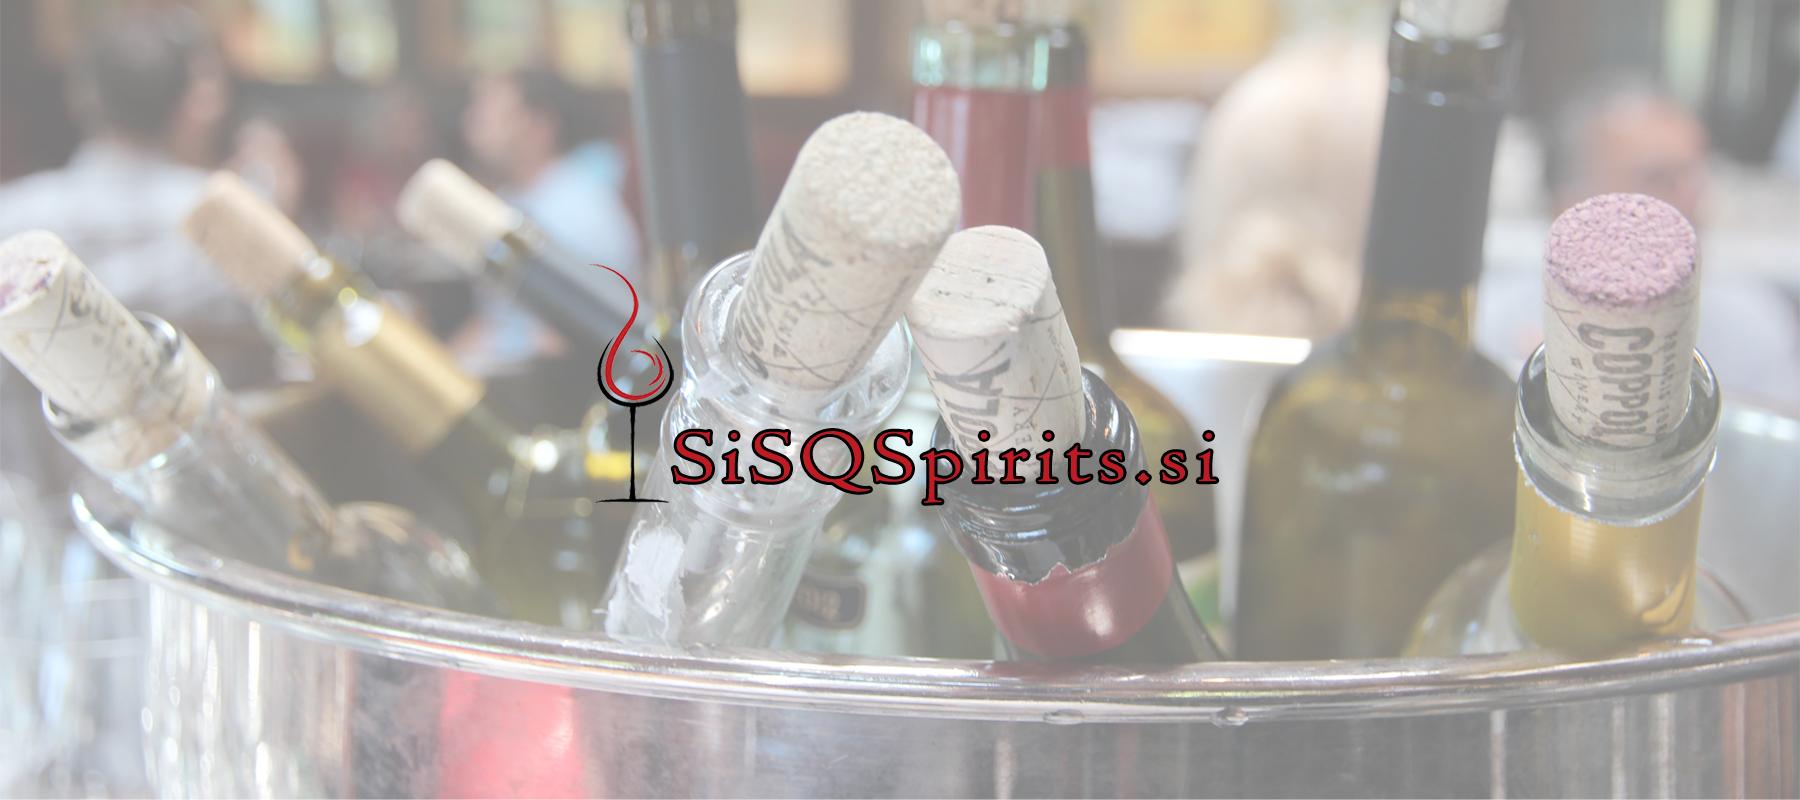 SiSQSpirits - spletna enoteka Mozirje